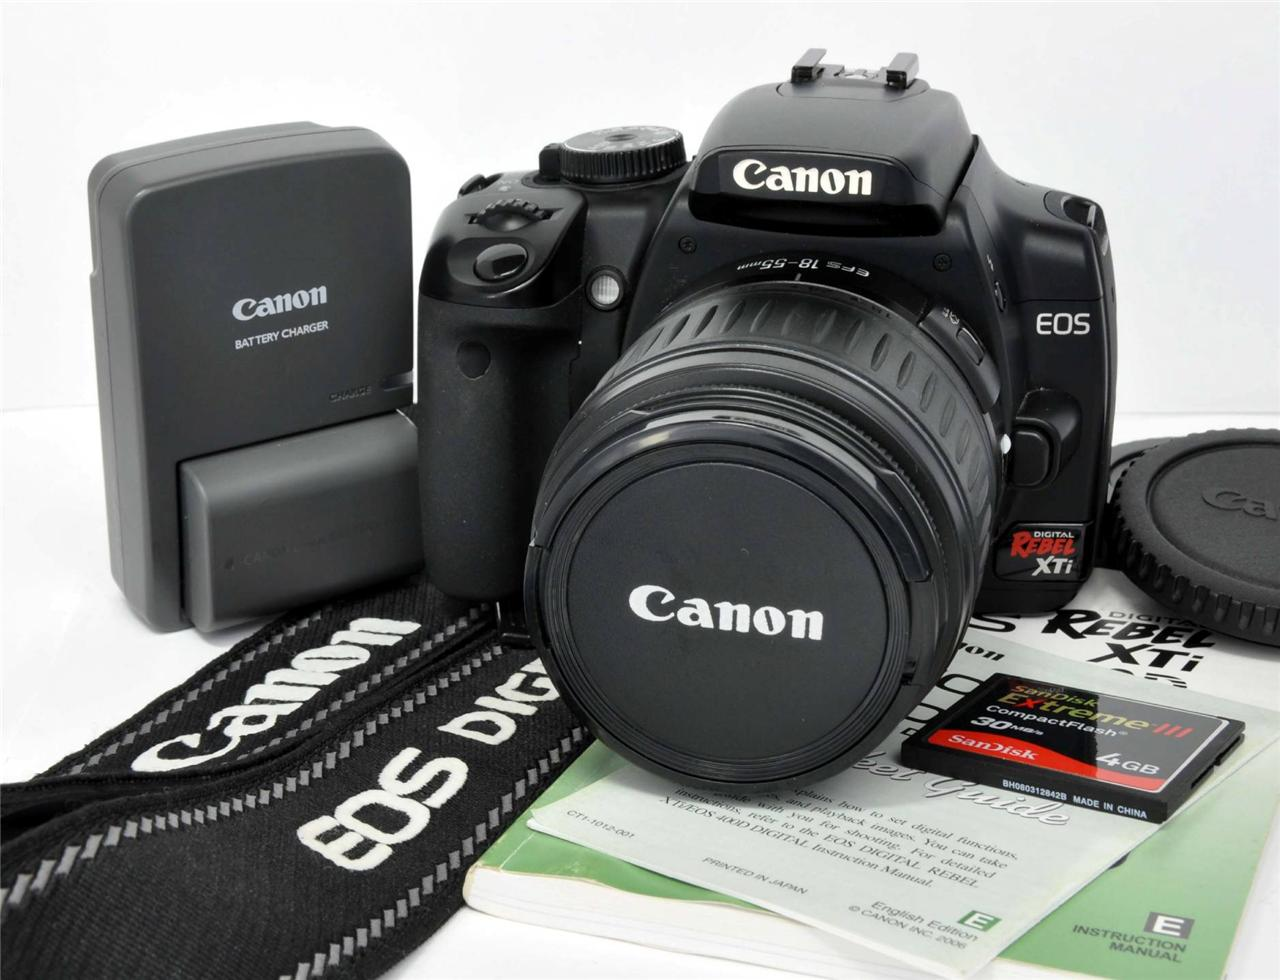 CANON 1236B001 - EOS DIGITAL REBEL XTI CAMERA SLR SOFTWARE ...